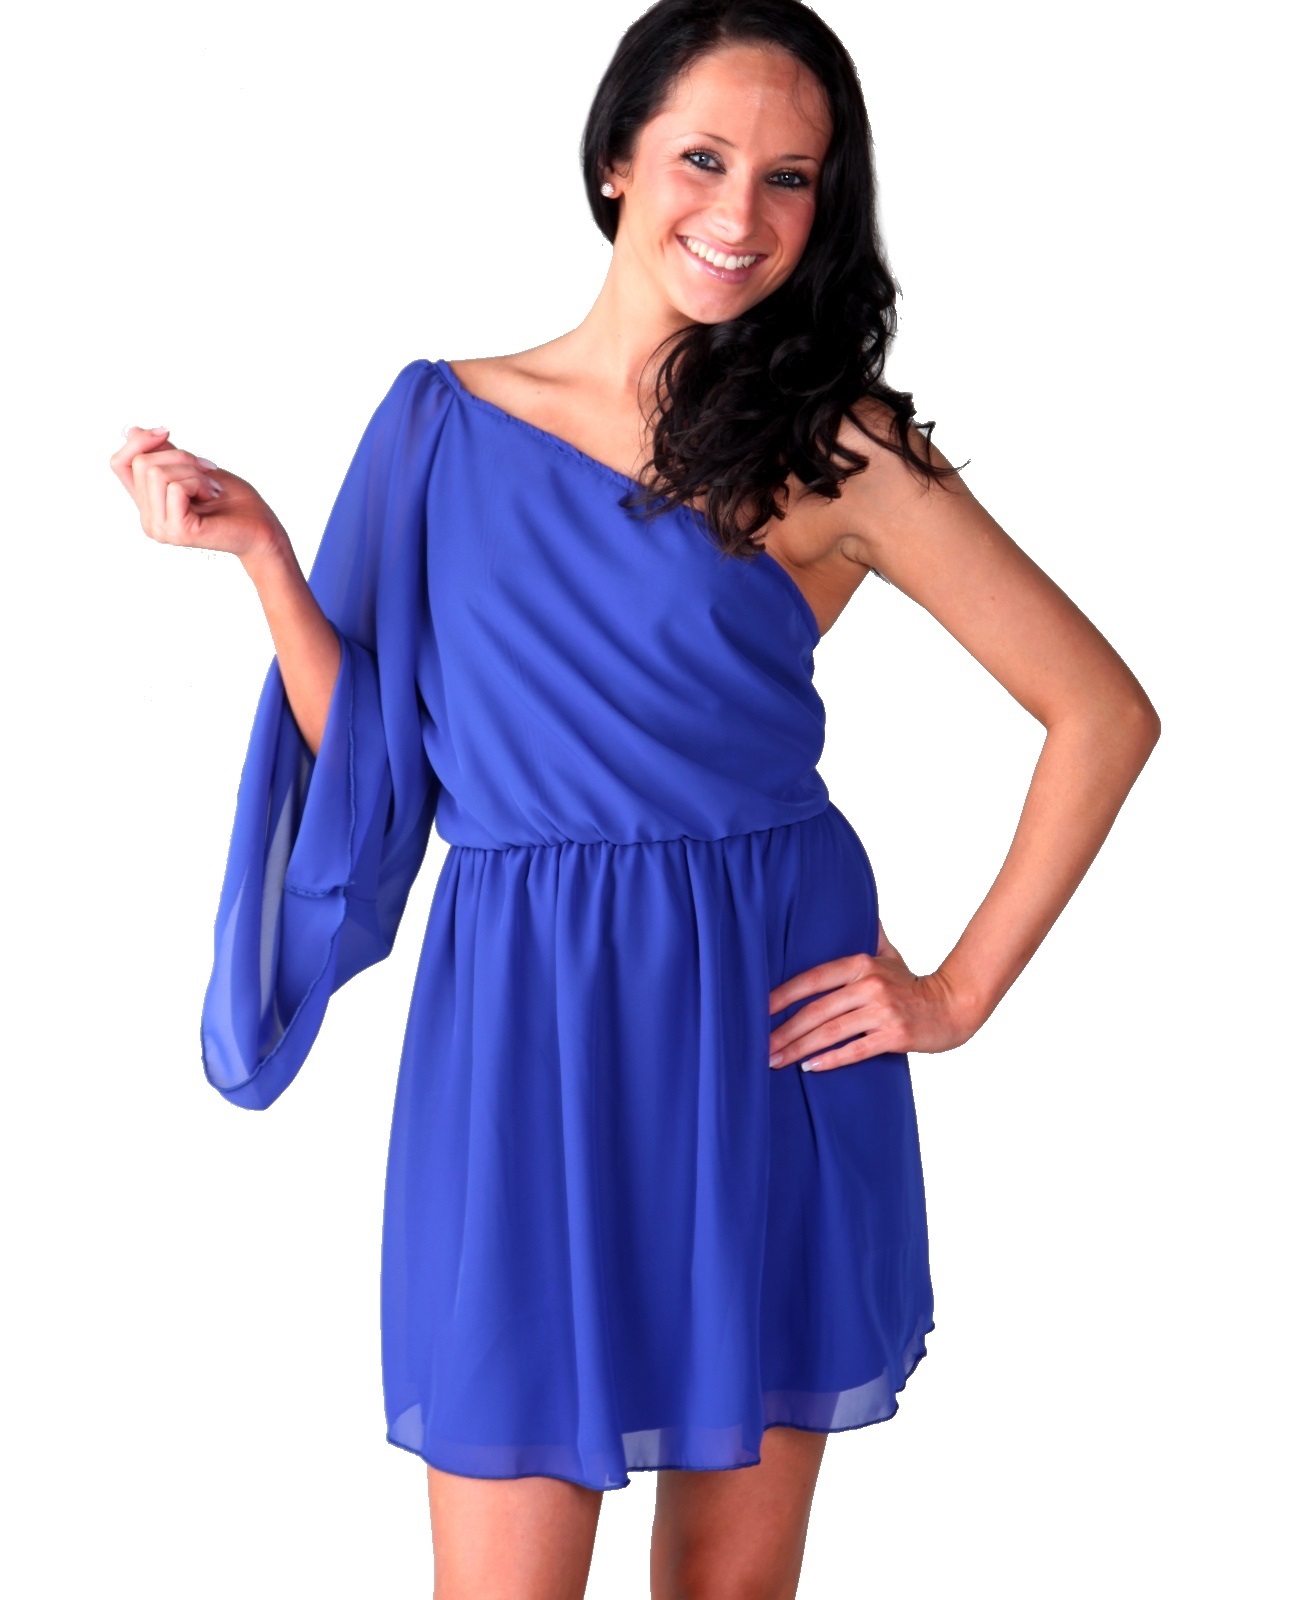 Chiffon Short Royal Blue Slanted Dress